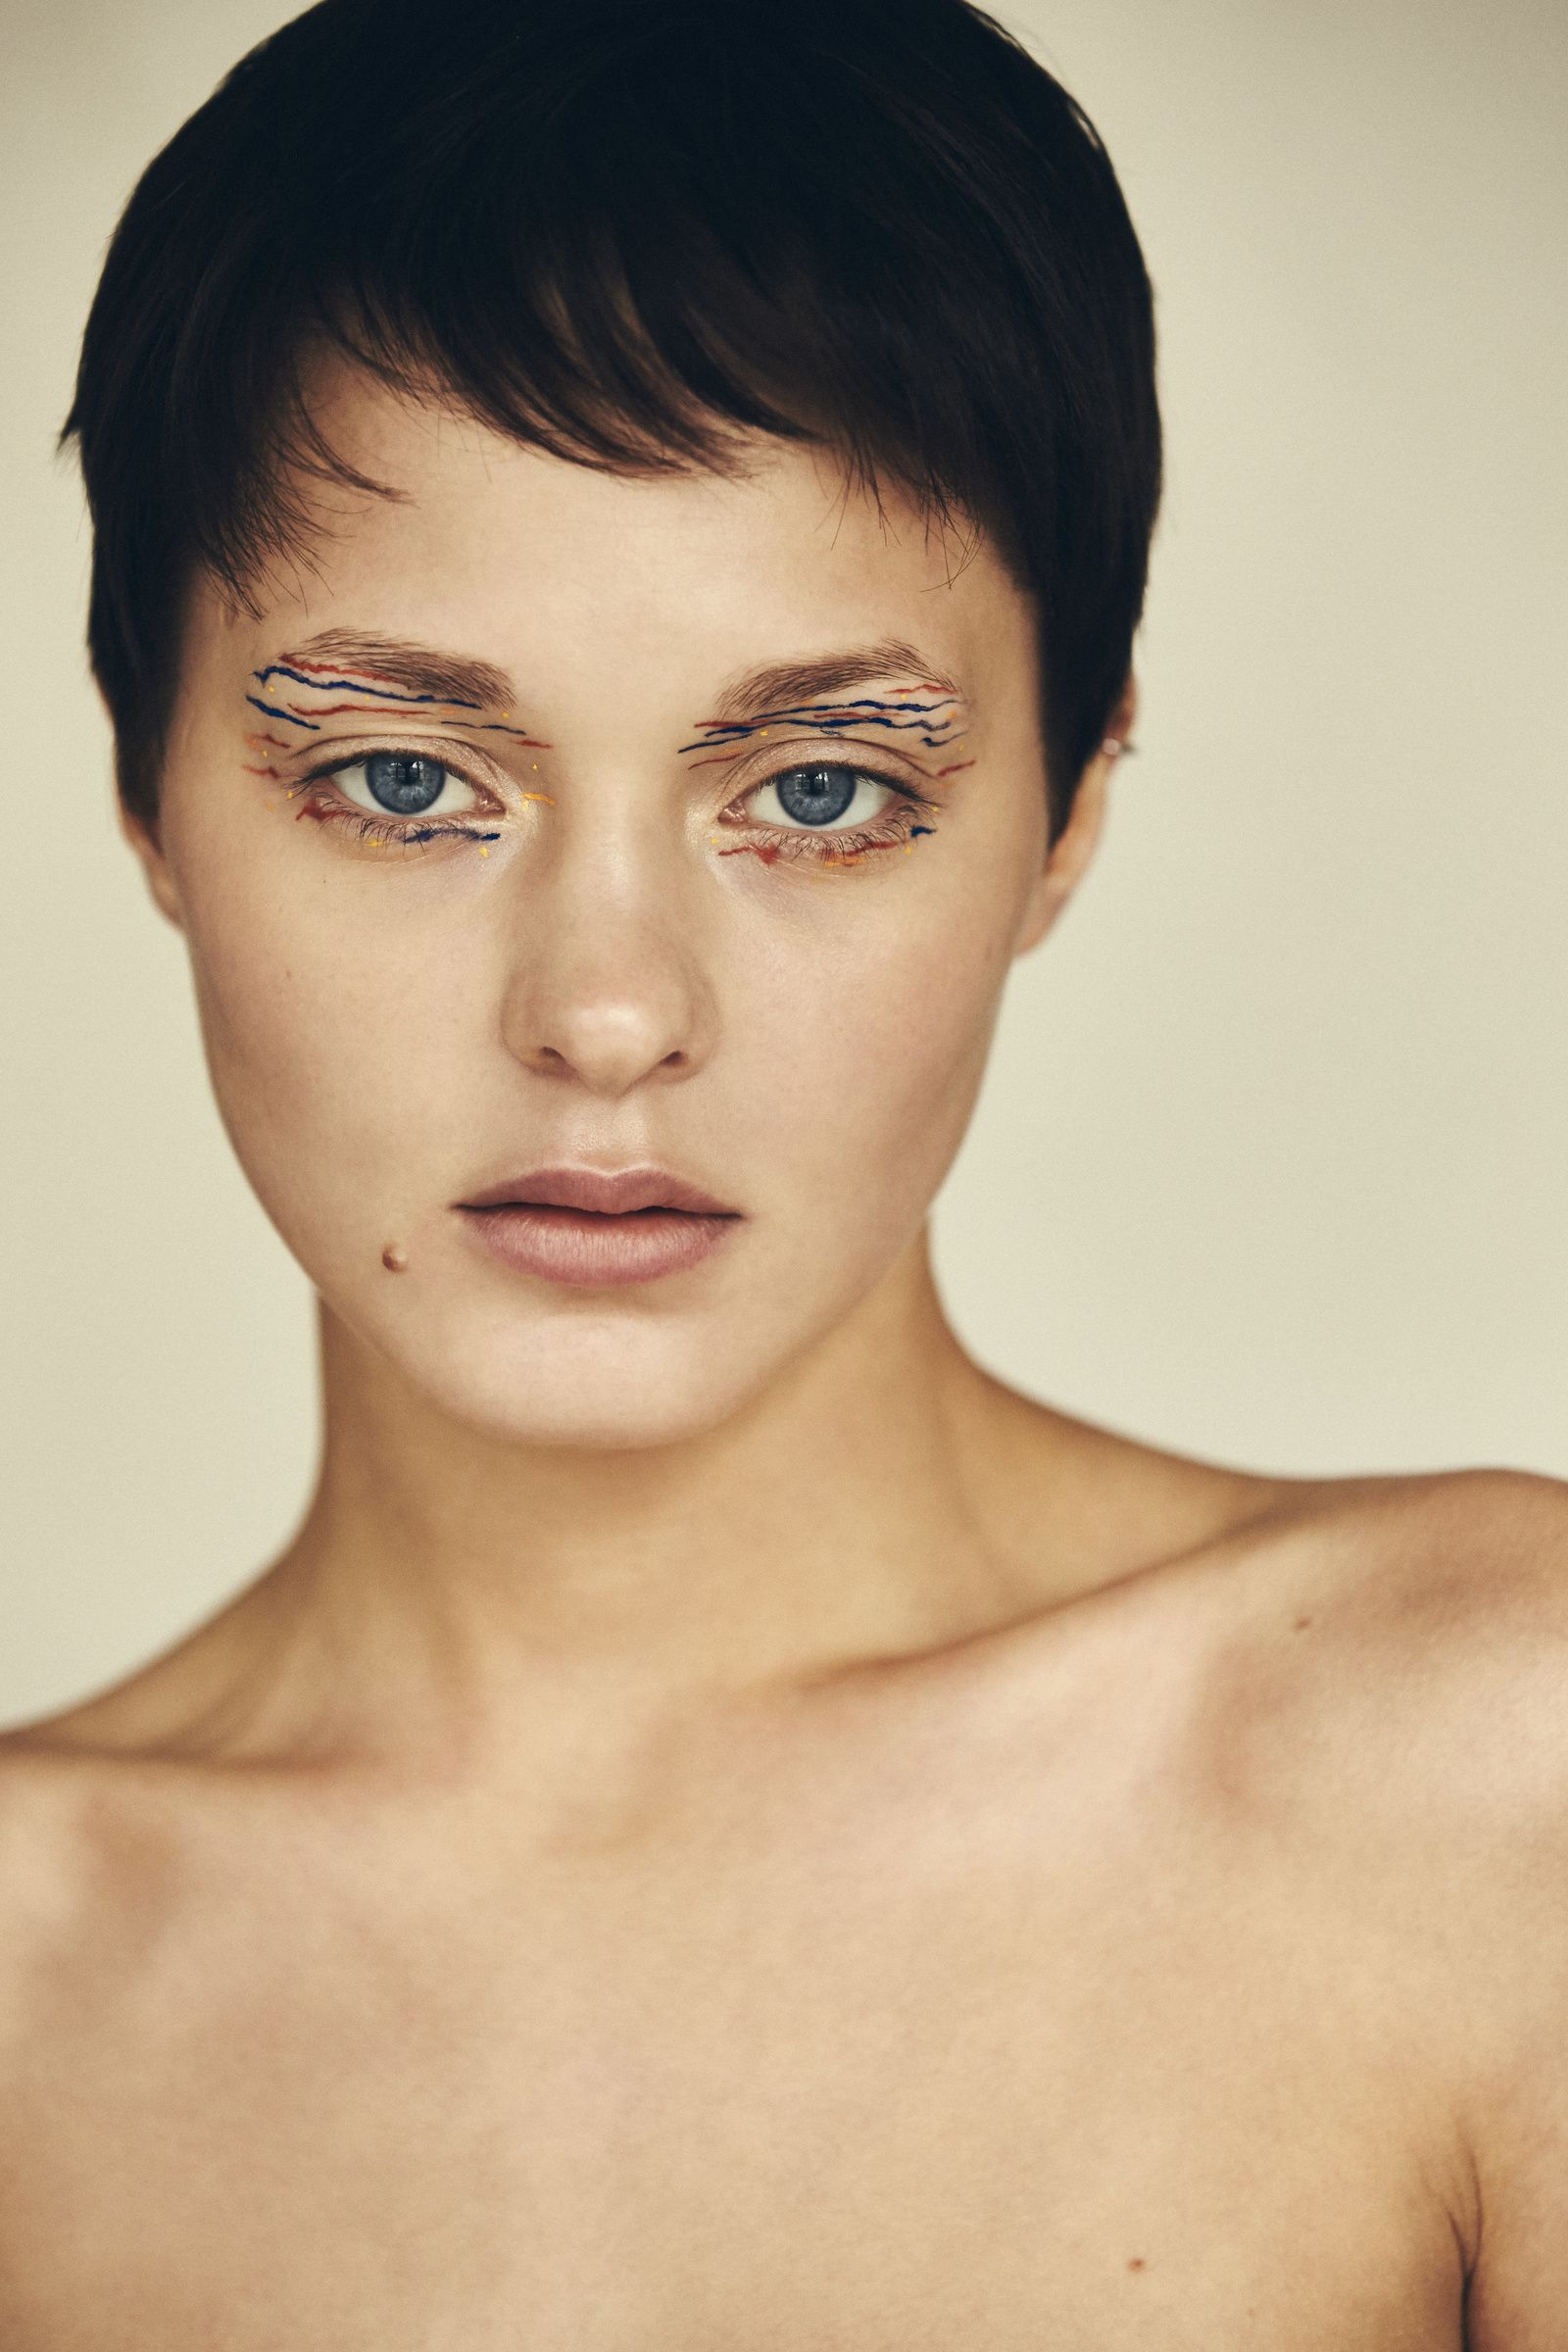 BEAUTY - Claire Plekhoff / Makeup artist based in Paris